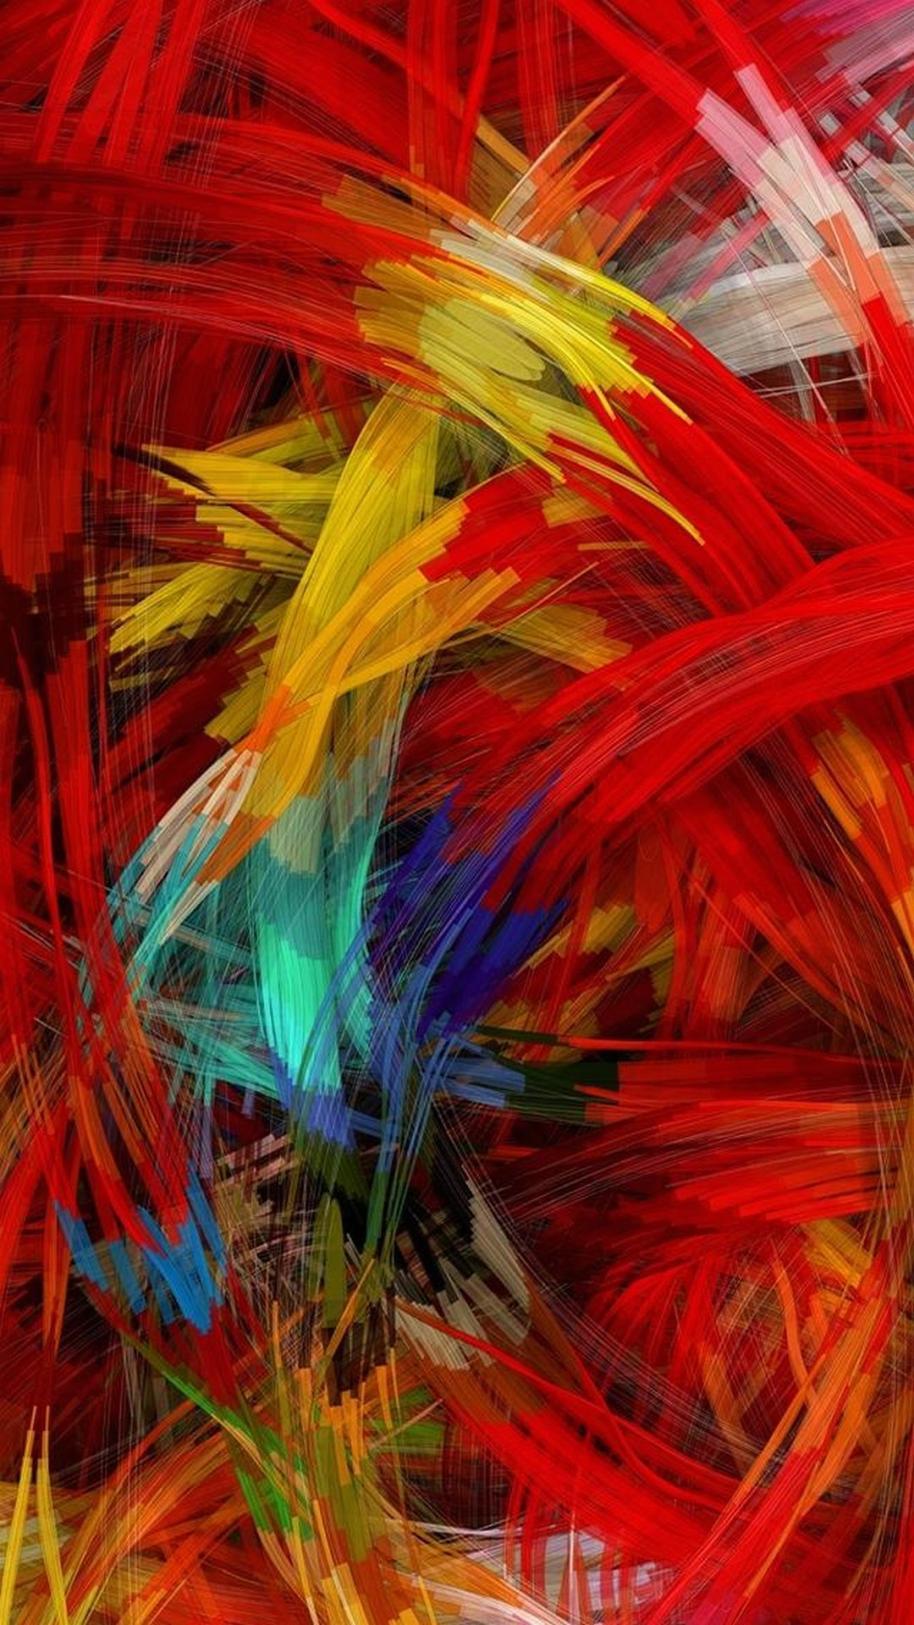 Hd wallpaper xda - Nexus 5 Wallpaper Hd Xda Wallpaper Full Hd 1080 X